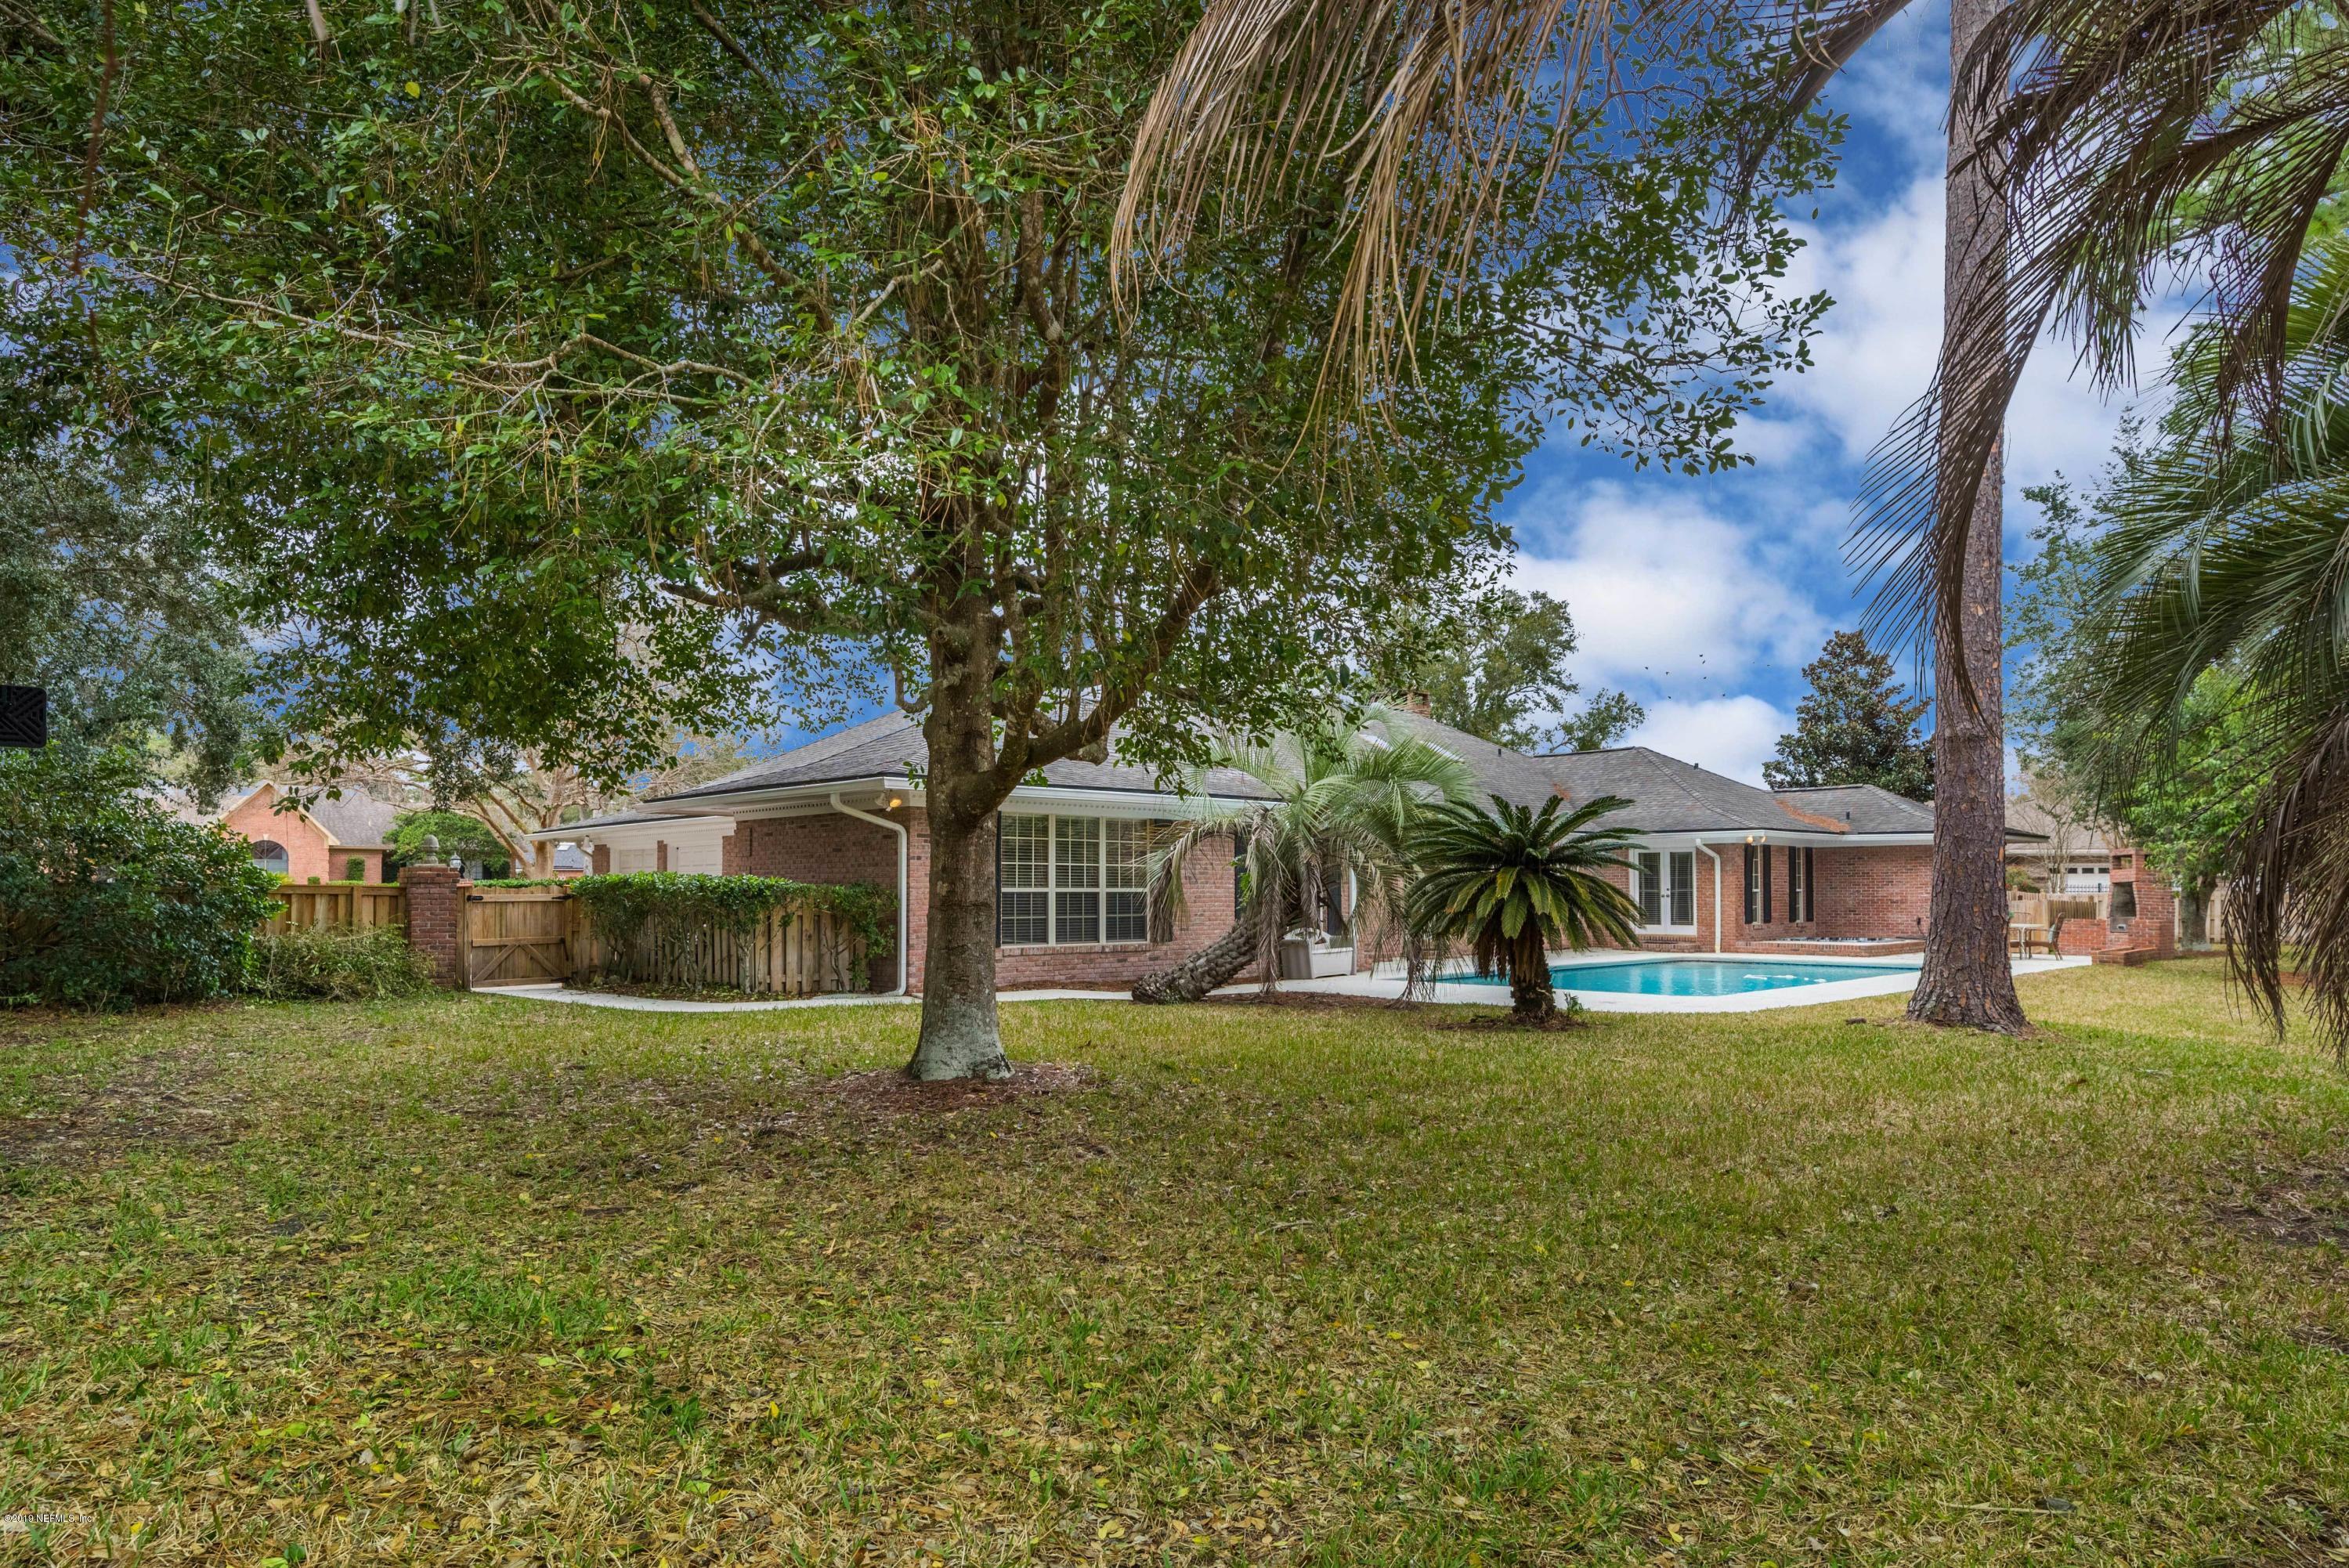 8153 MIDDLE FORK, JACKSONVILLE, FLORIDA 32256, 5 Bedrooms Bedrooms, ,4 BathroomsBathrooms,Residential - single family,For sale,MIDDLE FORK,978401